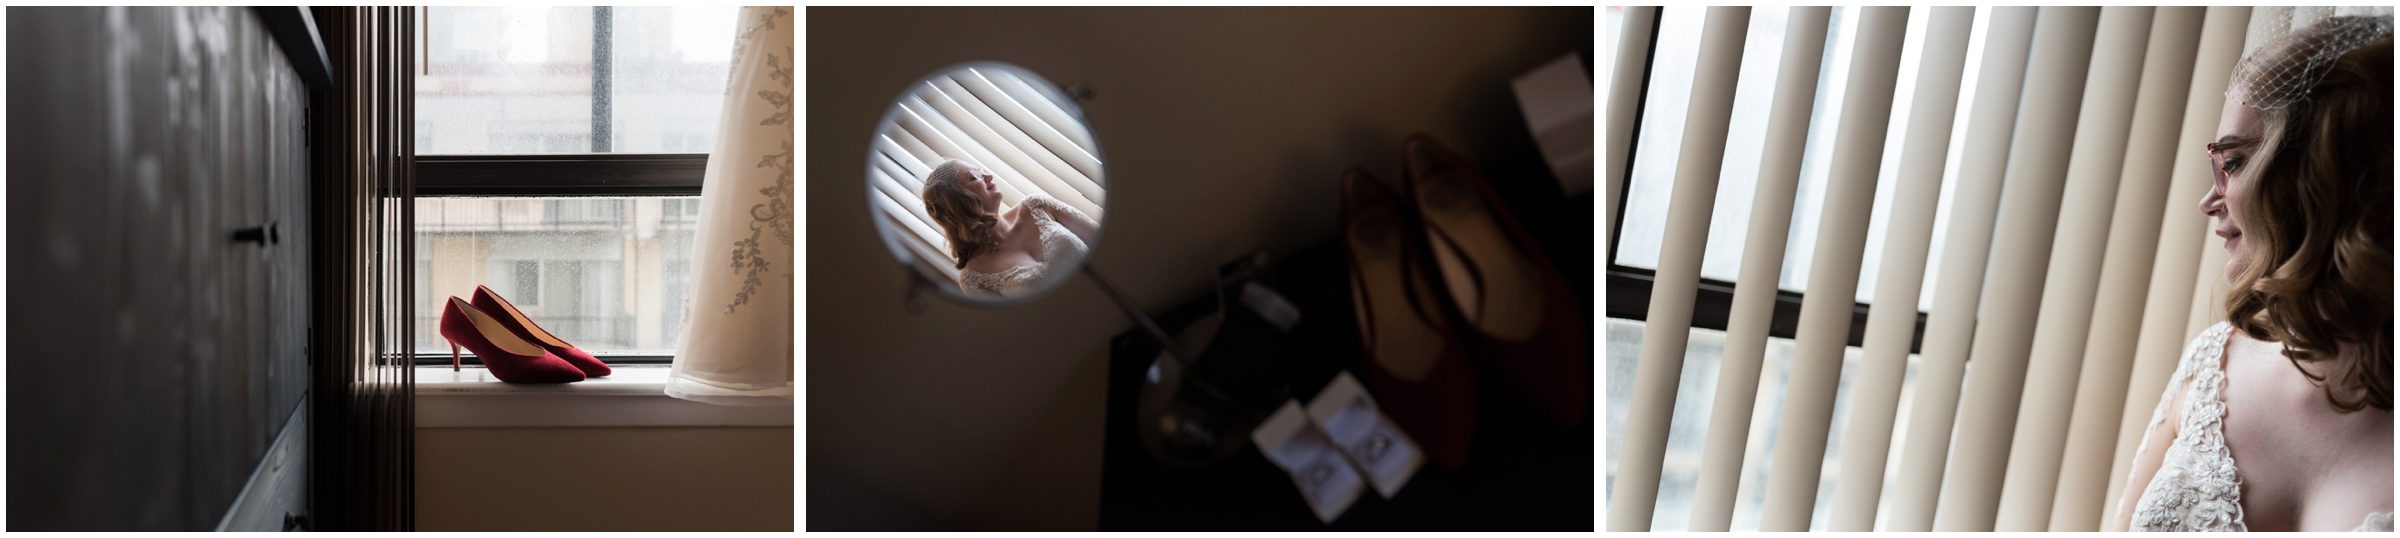 Ottaw Wedding Allison Andrew - (Selena Phillips-Boyle)_0018.jpg